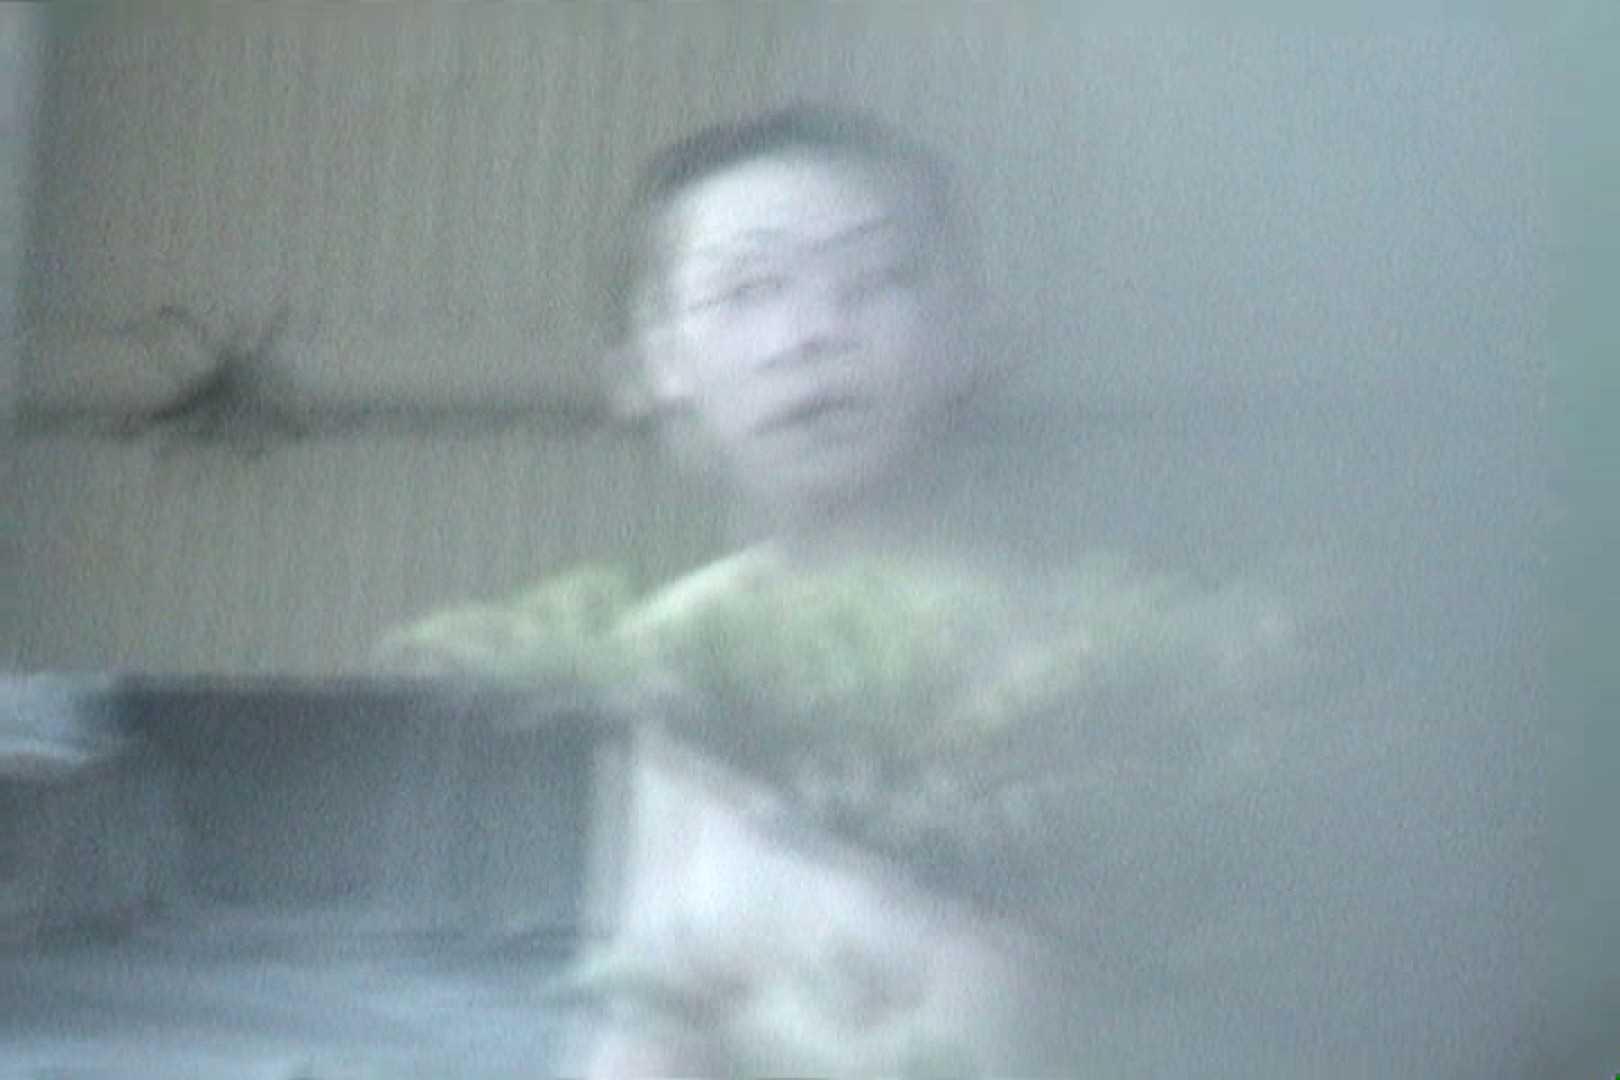 Aquaな露天風呂Vol.643 露天風呂編 | 盗撮シリーズ  88PIX 63